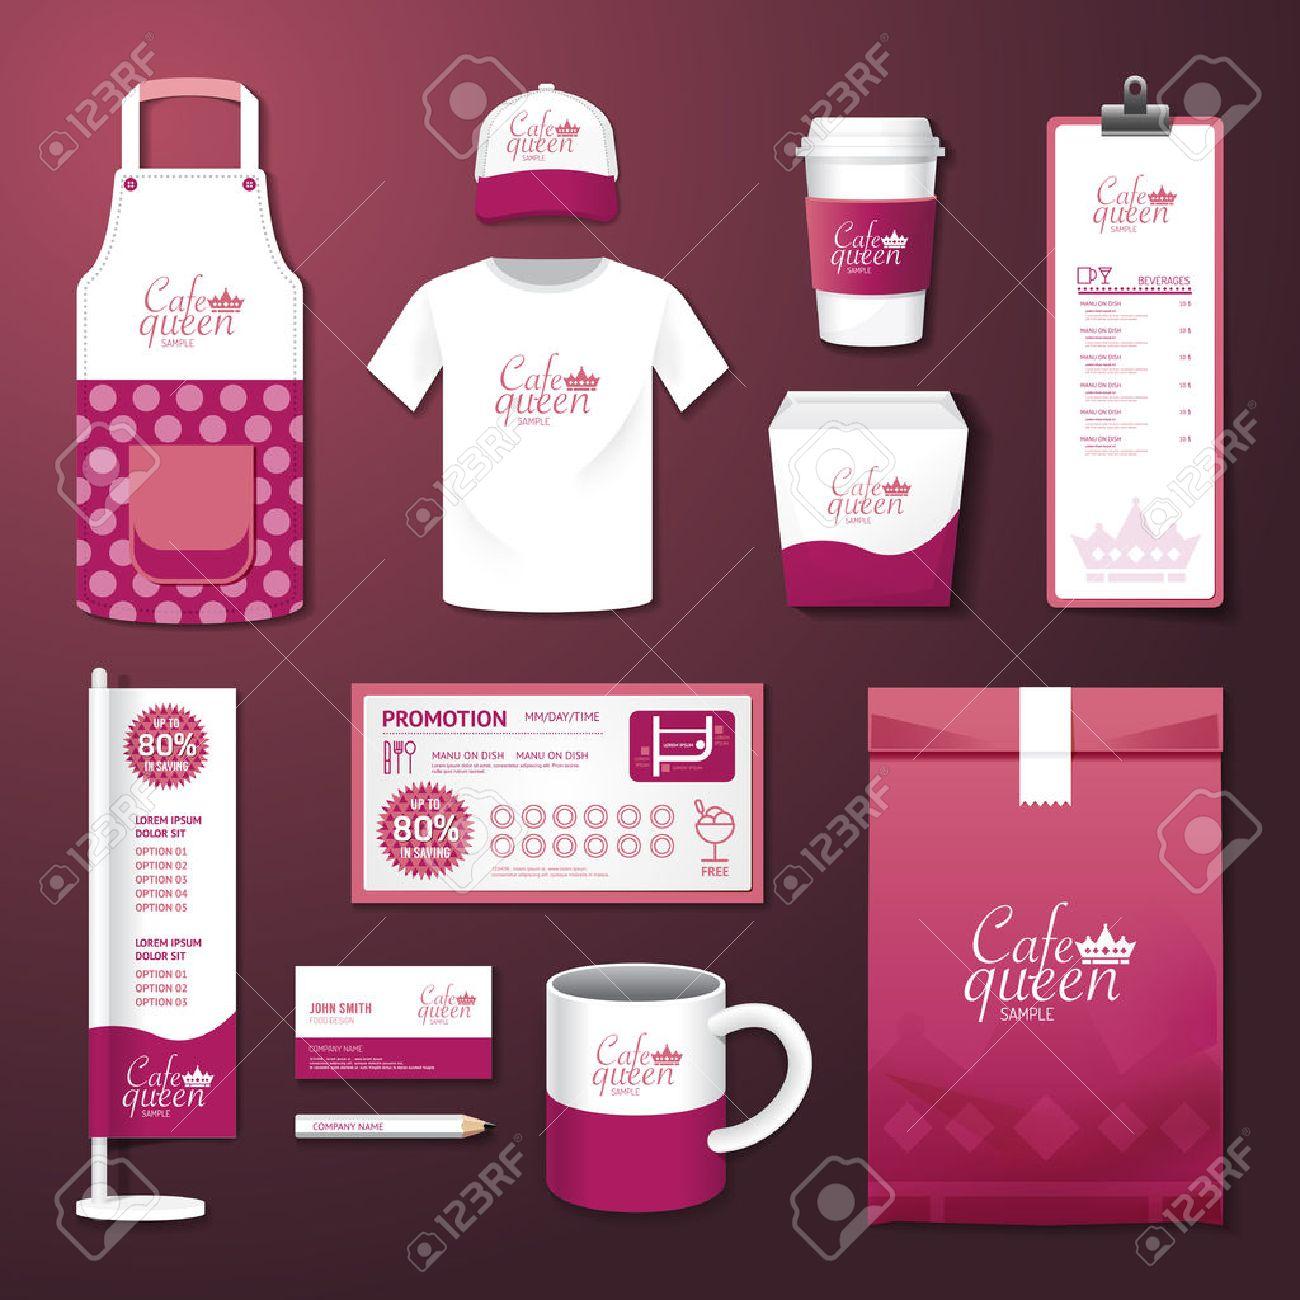 Vector restaurant cafe set flyer, menu, package, t-shirt, cap, uniform design/ layout set of corporate identity template. Standard-Bild - 37344924